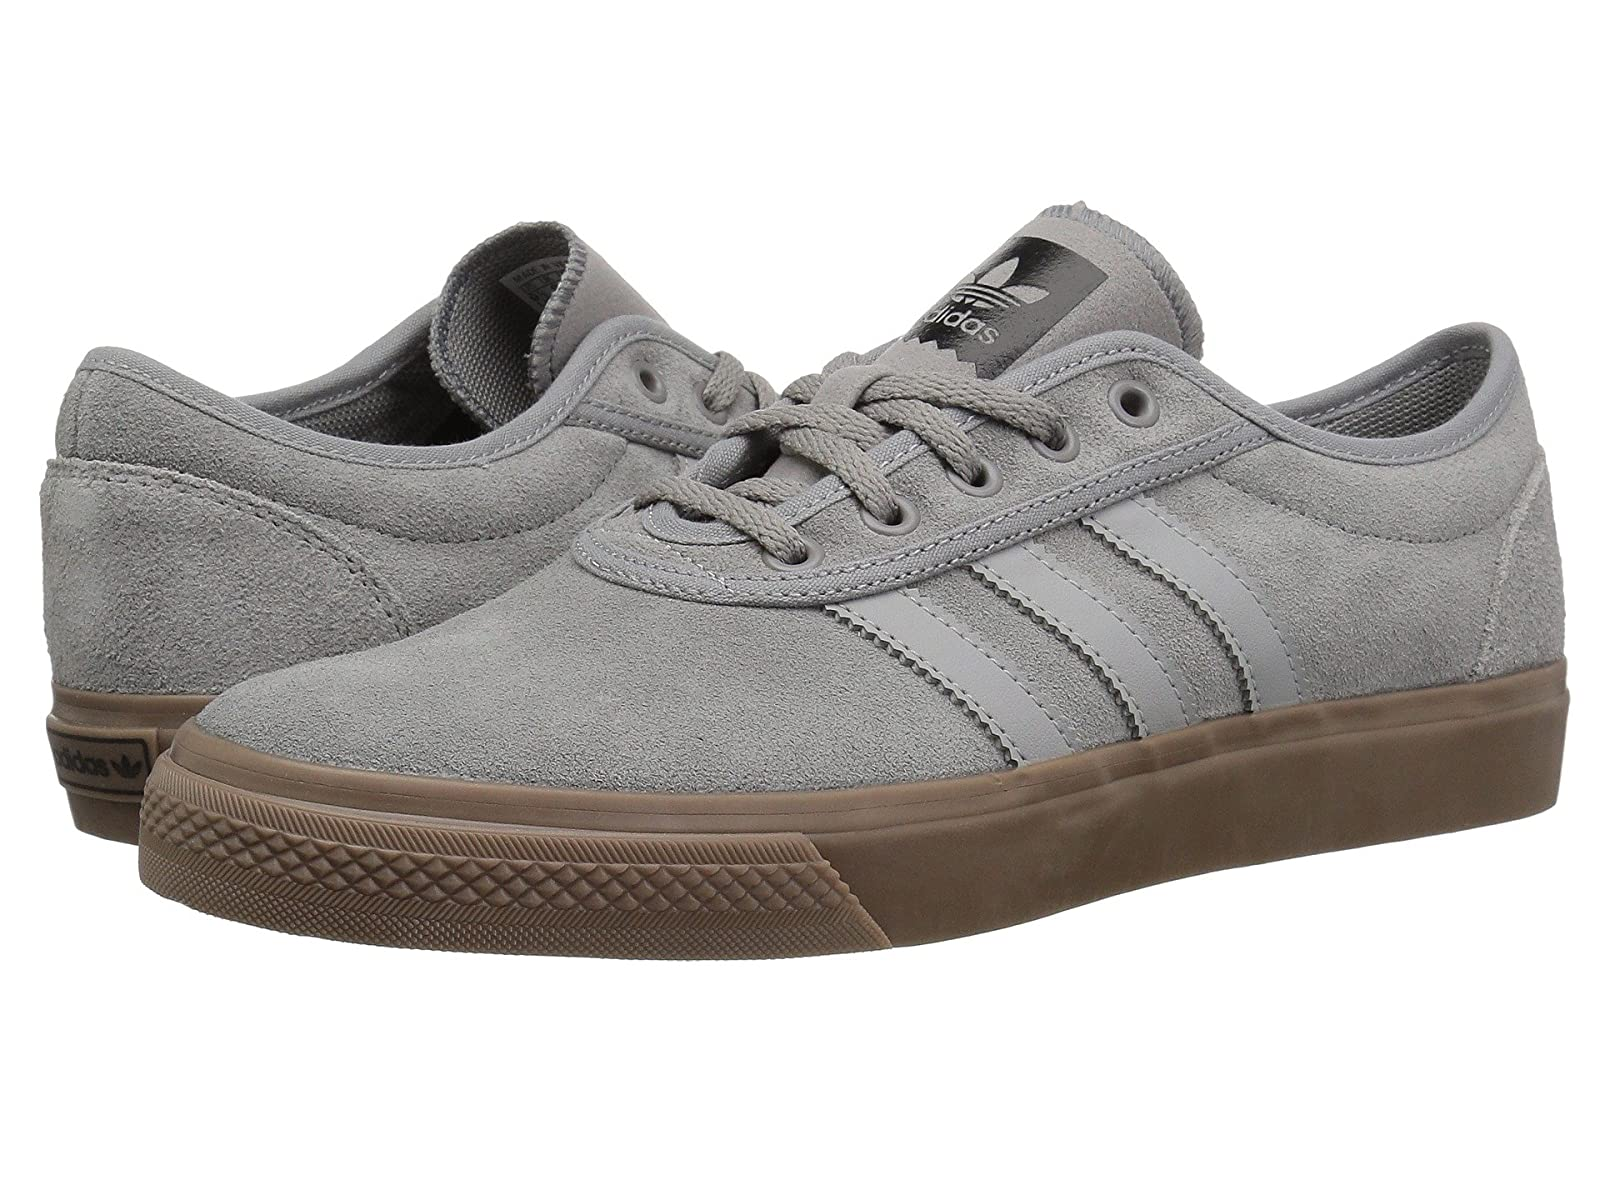 adidas Skateboarding Adi-EaseAtmospheric grades have affordable shoes